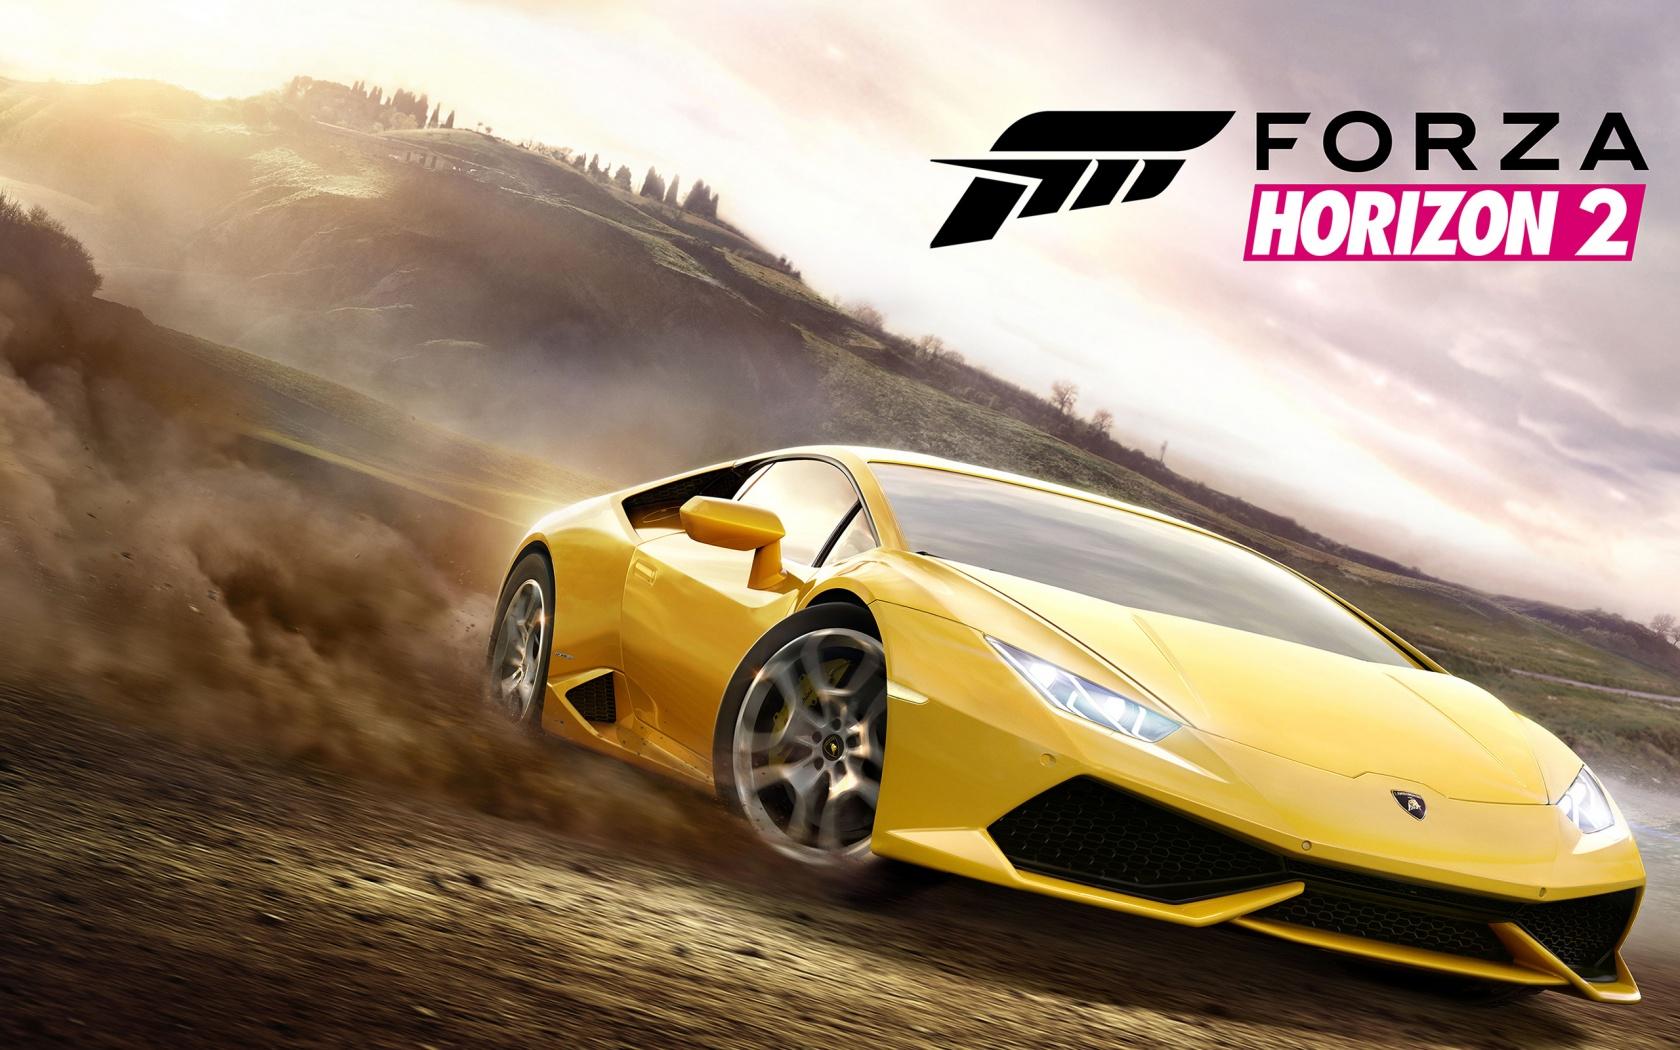 Forza Horizon 2 Wallpapers HD Wallpapers 1680x1050